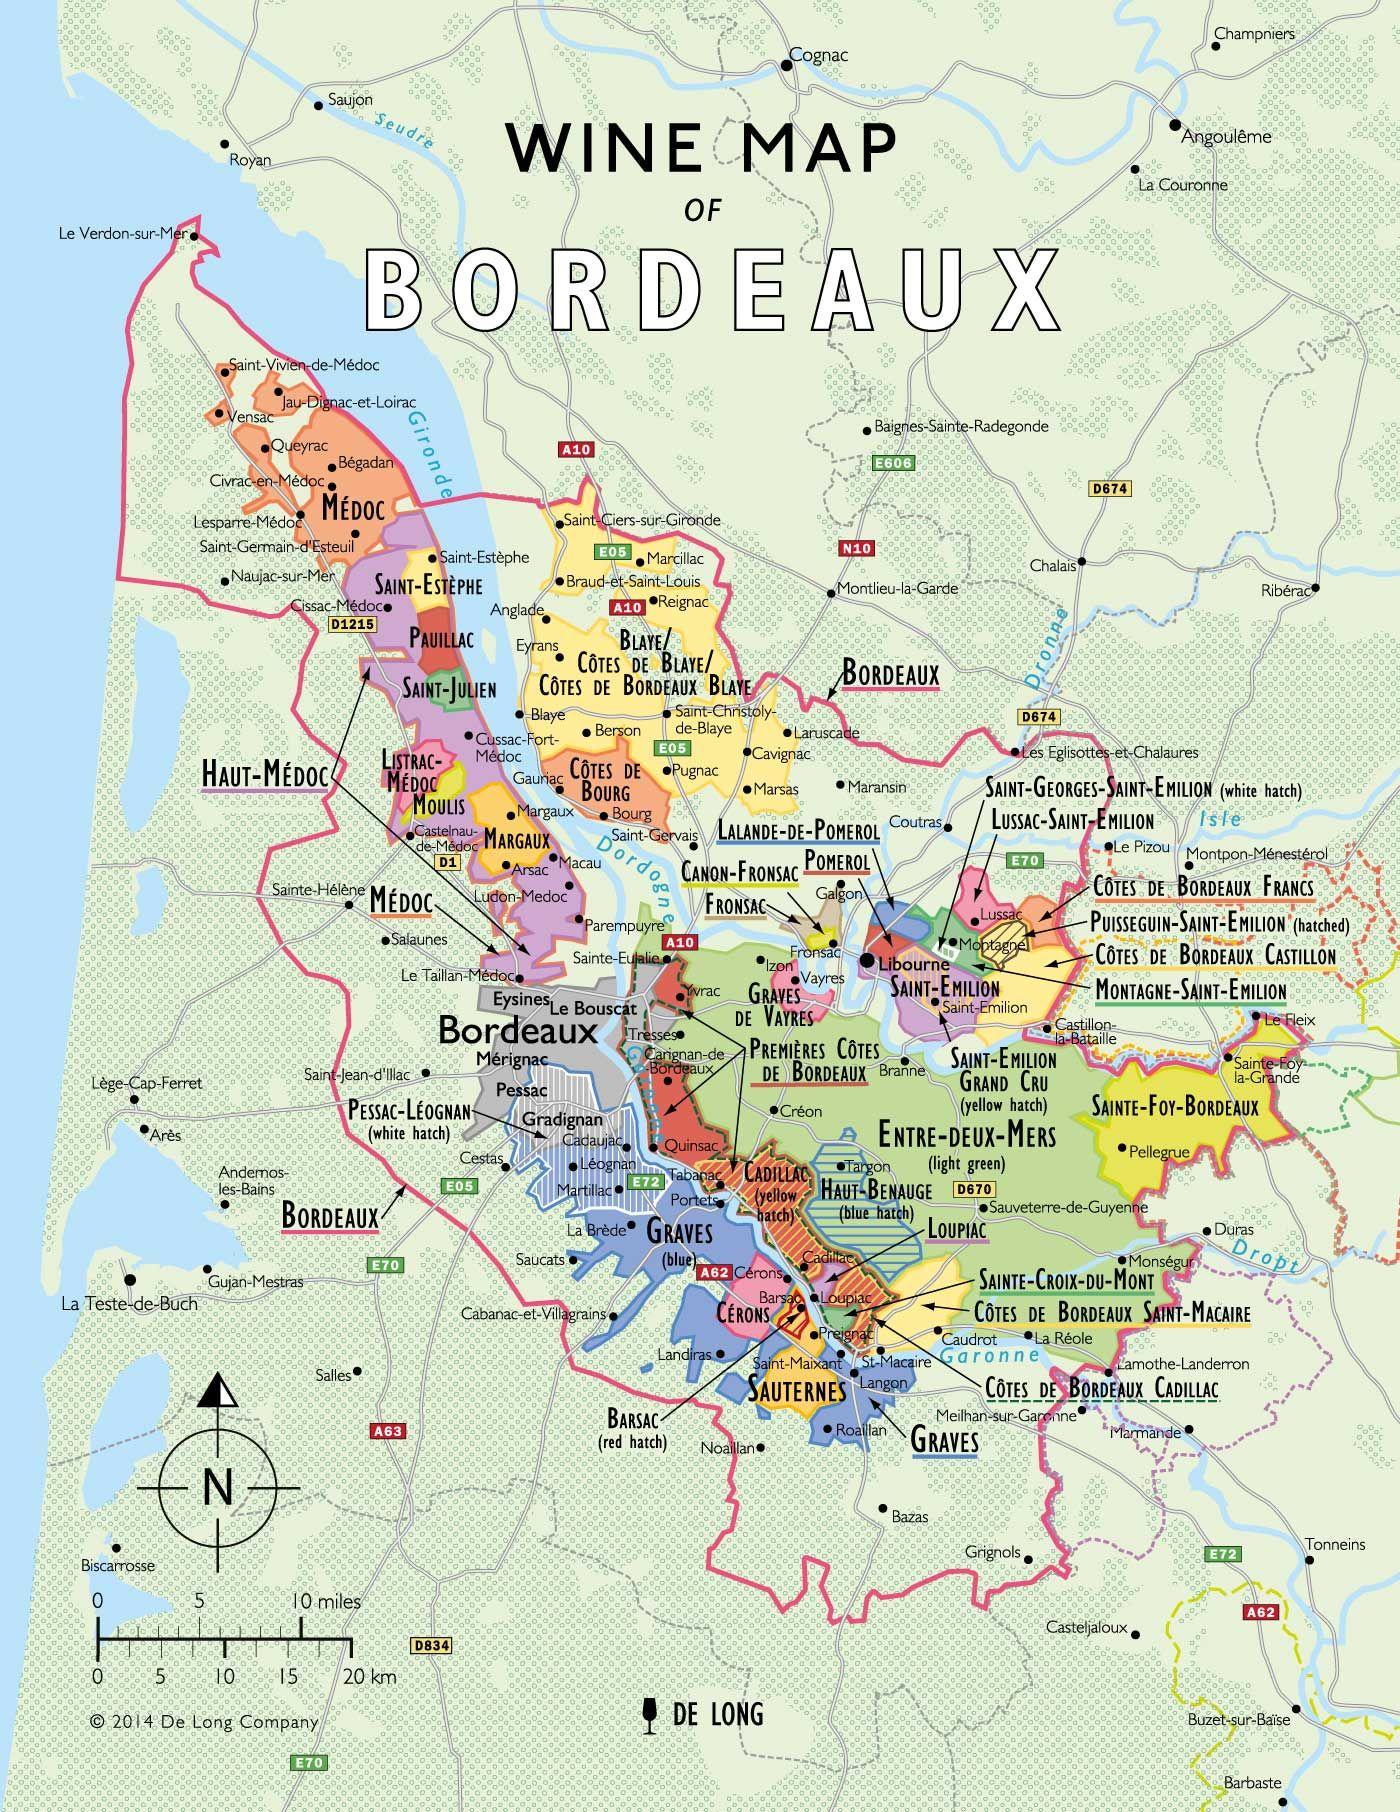 Bordeaux wine map largeg 14001812 place were i want to go bordeaux wine map largeg 14001812 gumiabroncs Choice Image